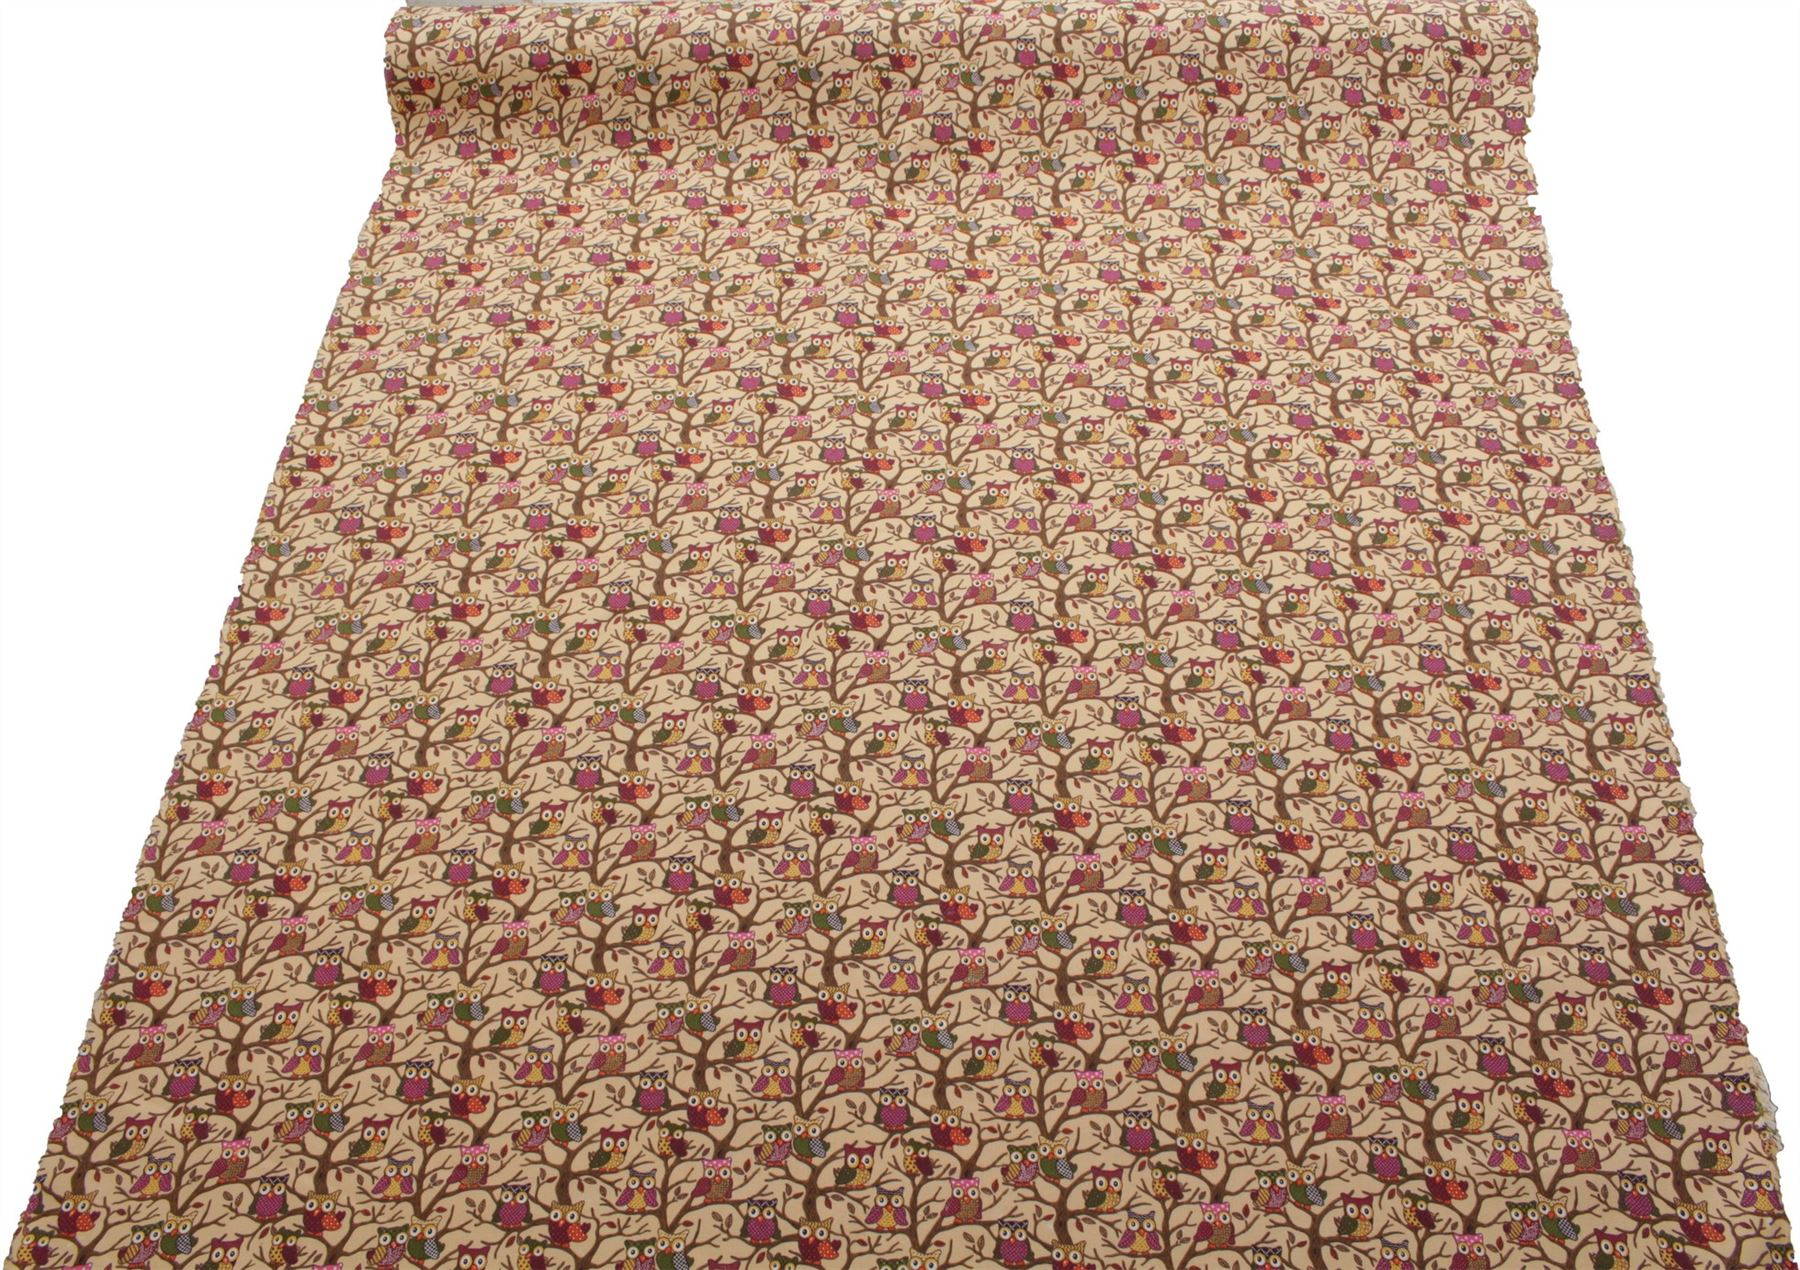 thumbnail 58 - 100% Heavy Cotton Panama Printed Childrens Curtain Cushion Upholstery Fabric